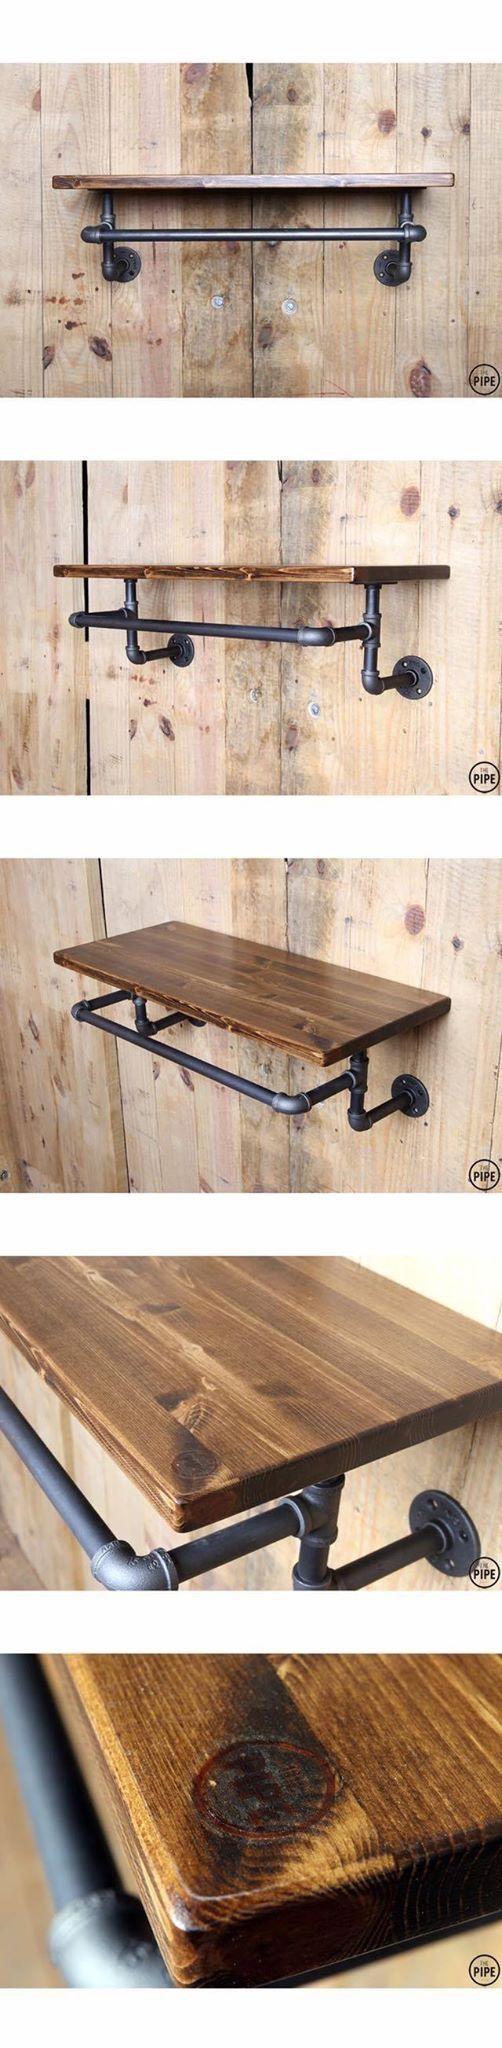 Idea for pre cuts and quilt shelf Pre cuts